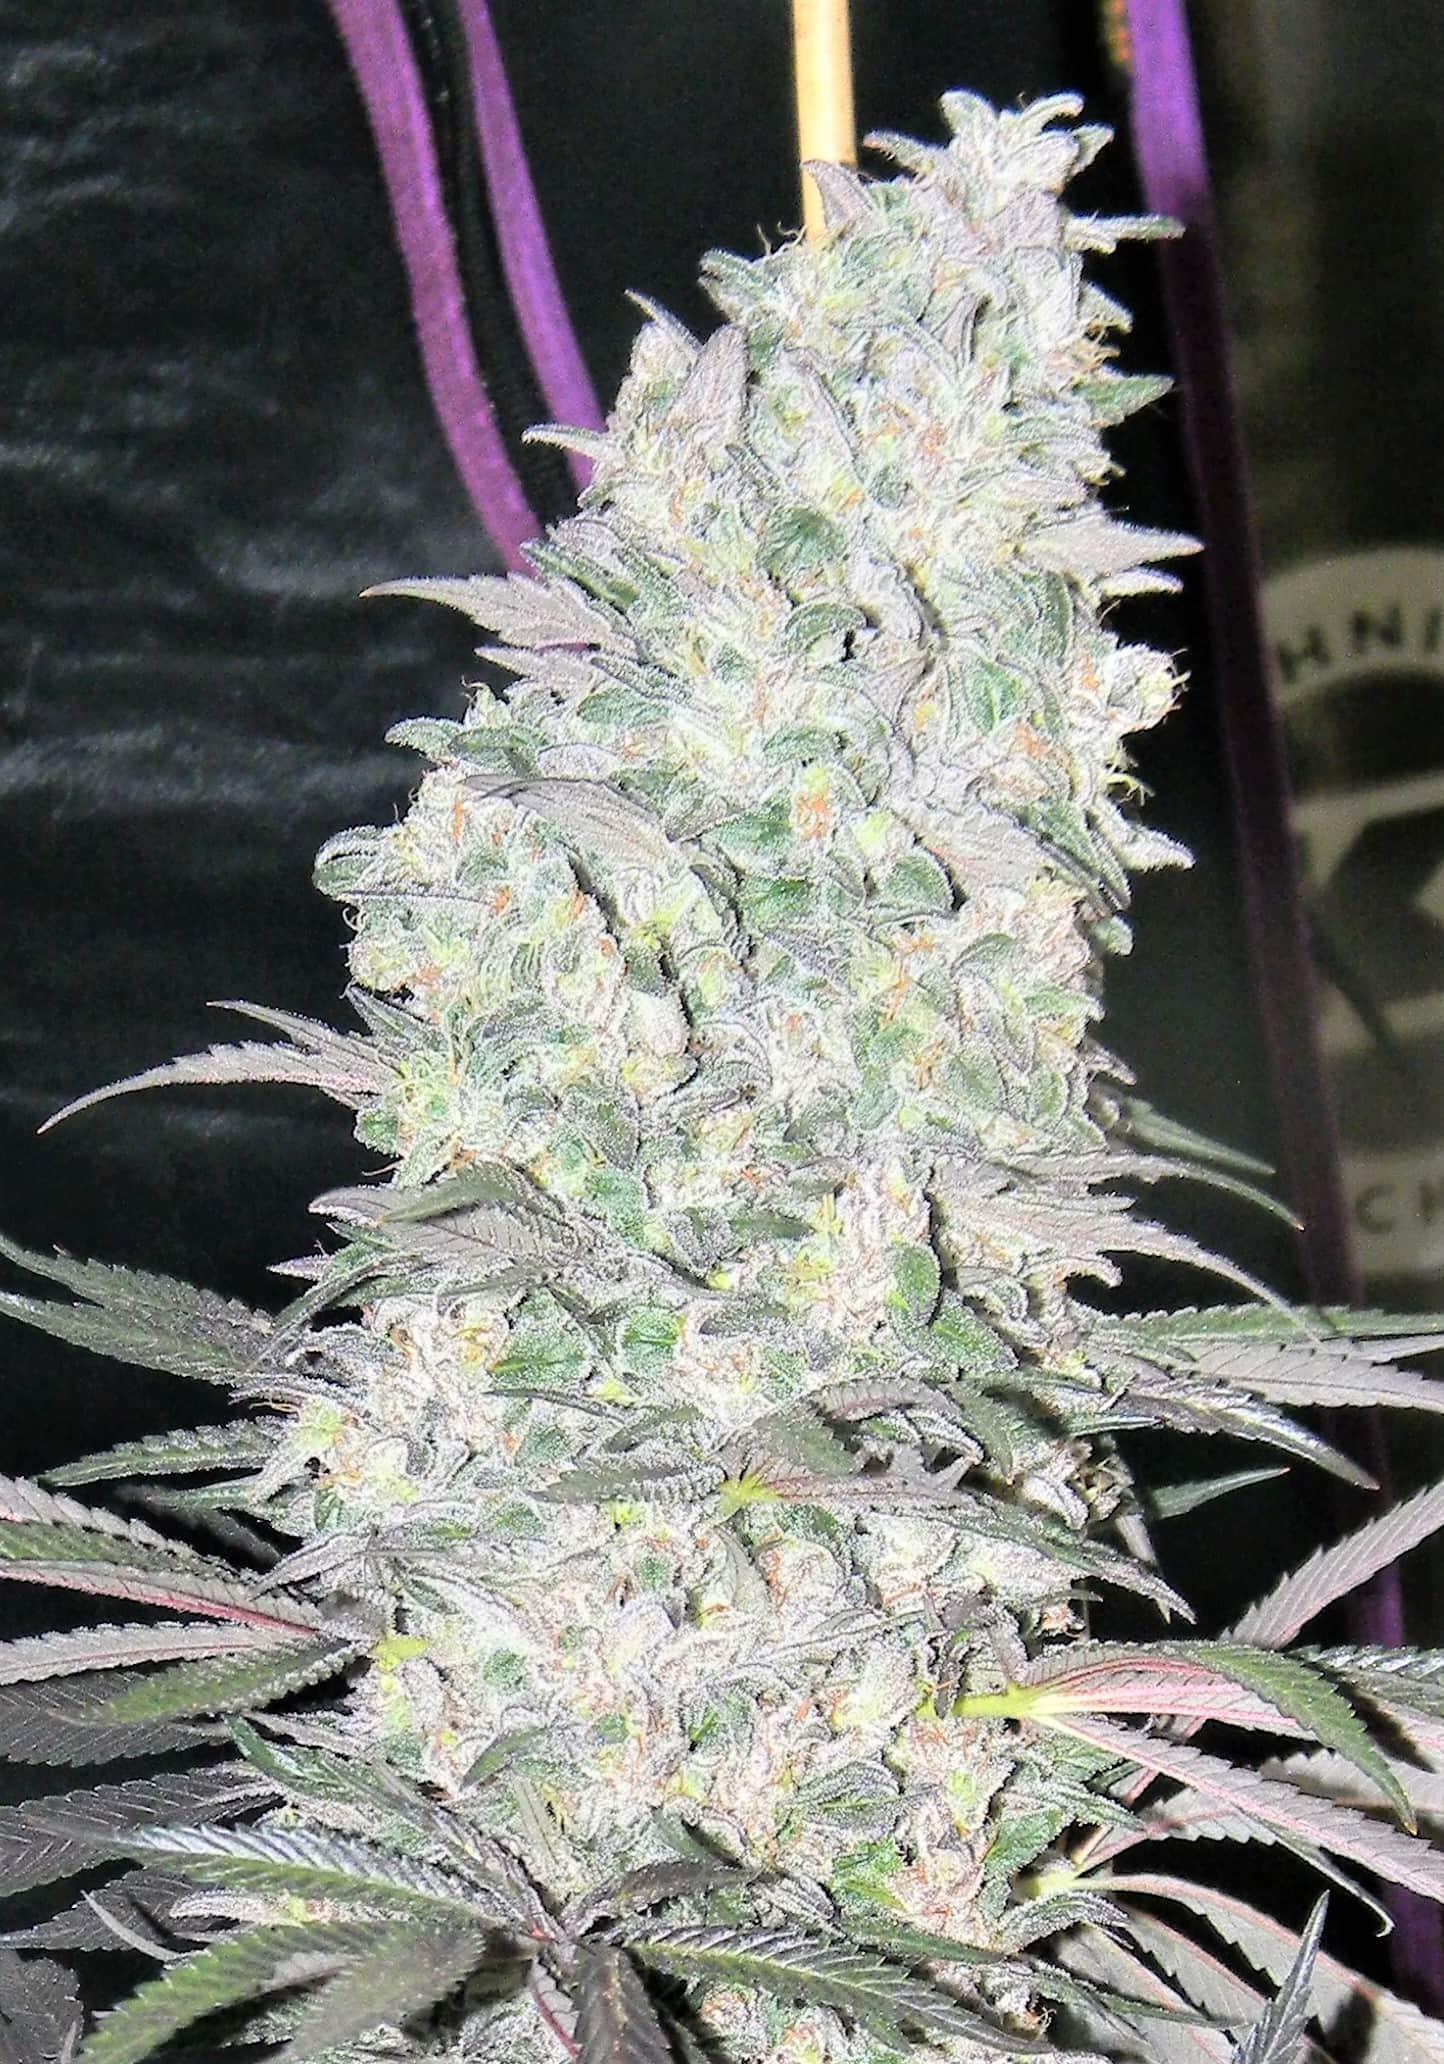 TNT Cannabis Seeds - Deathstar x Stardawg Strain | Greenpoint Seeds